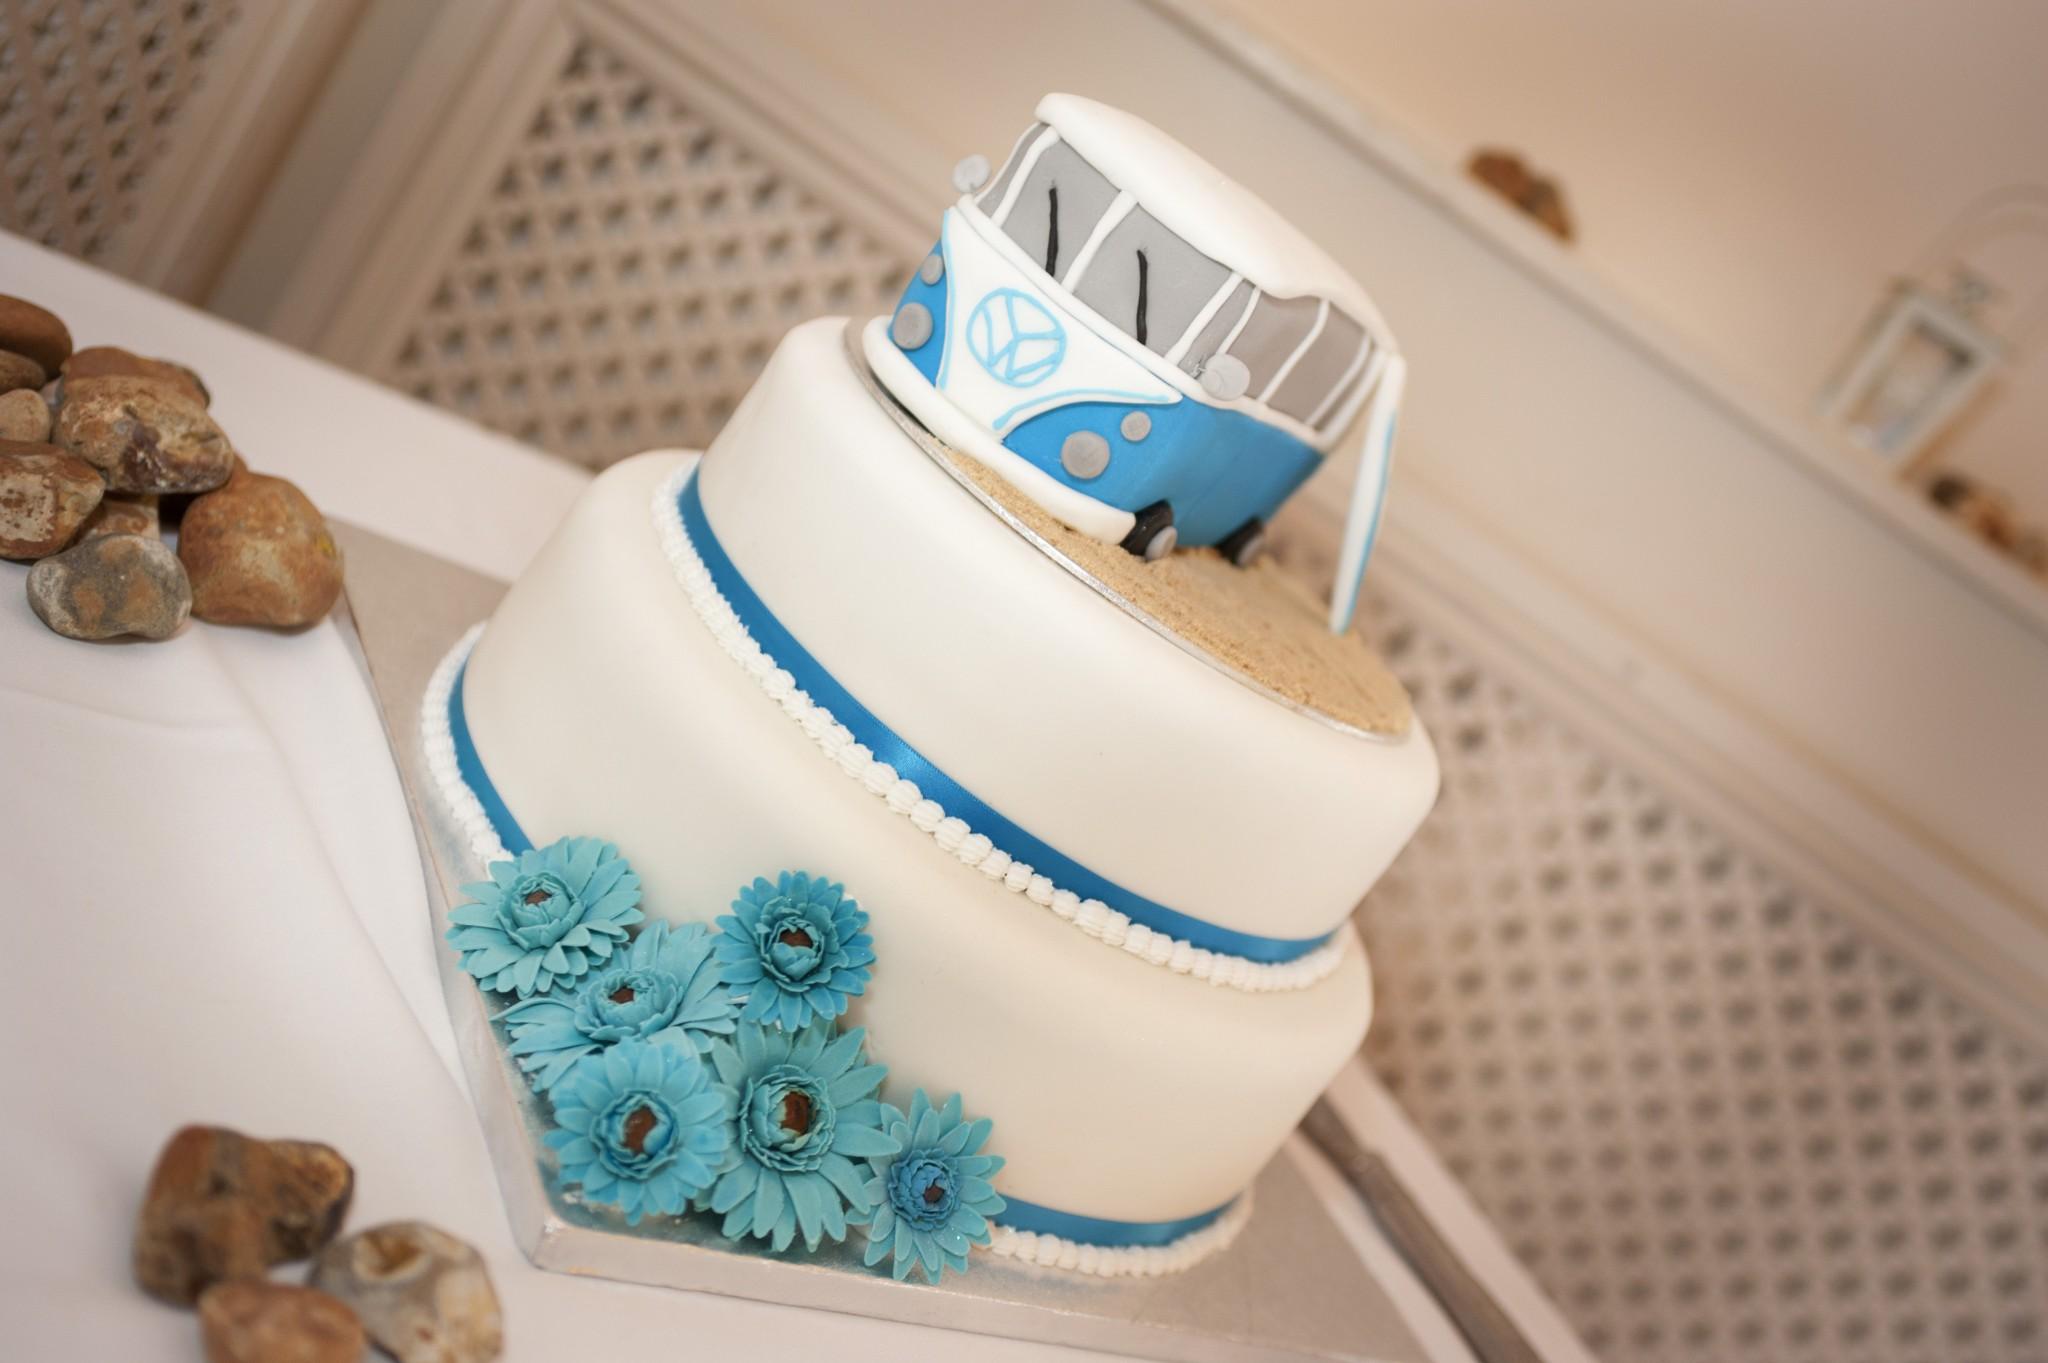 VW Campervan wedding cake, how it all began, wedding cakes, weddings, cakes, vw campervans, campervan